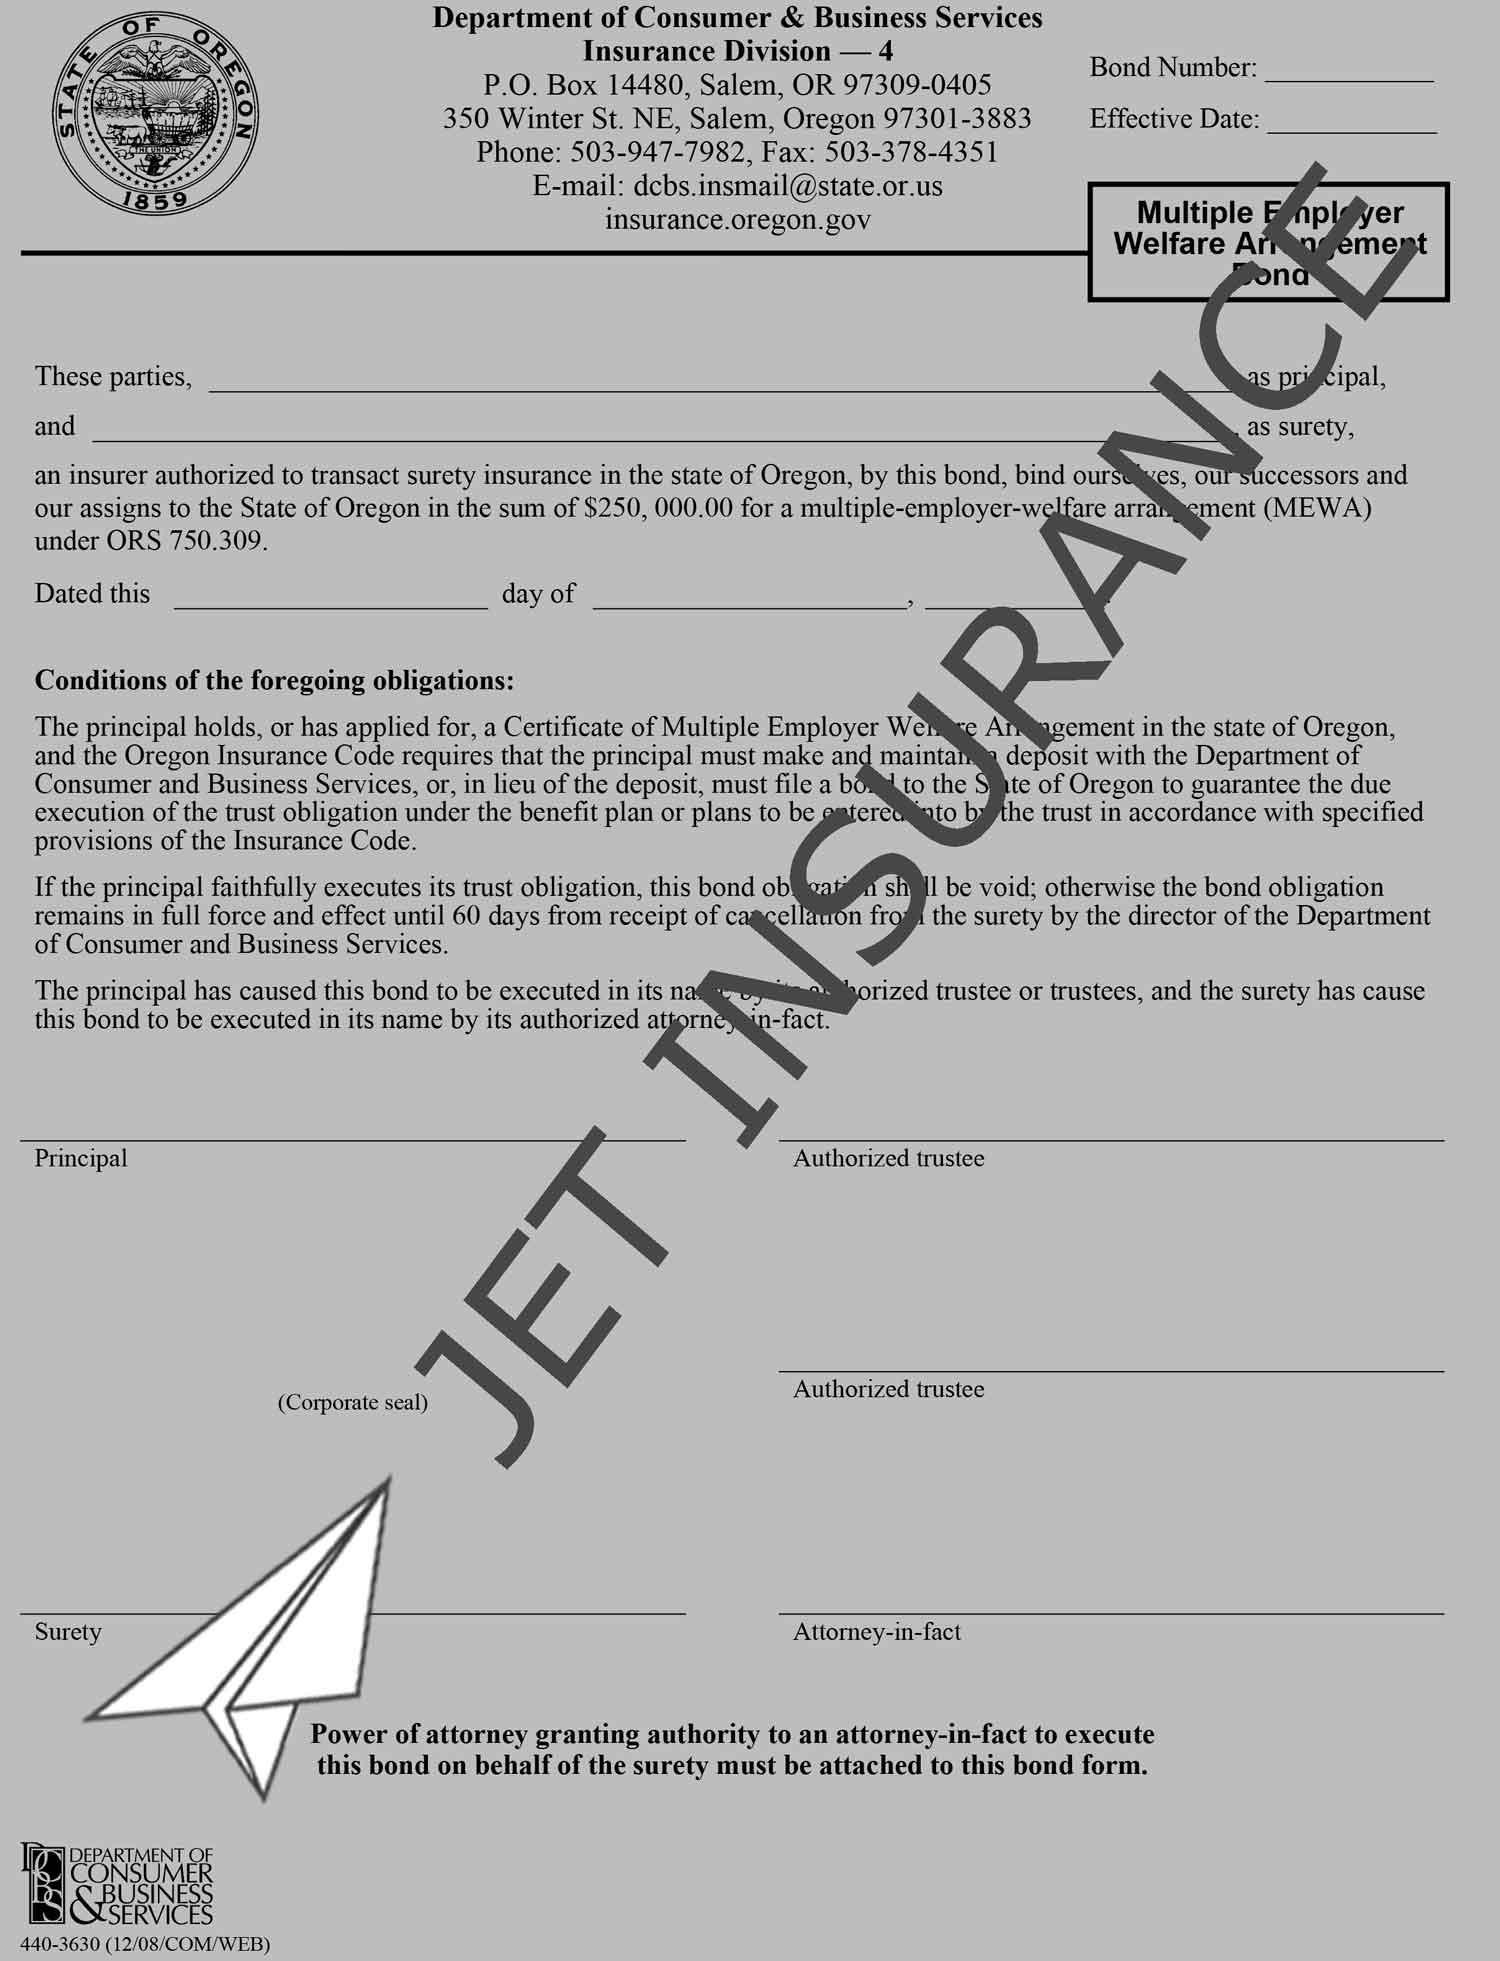 Oregon Multiple Employer Welfare Arrangement Bond Form